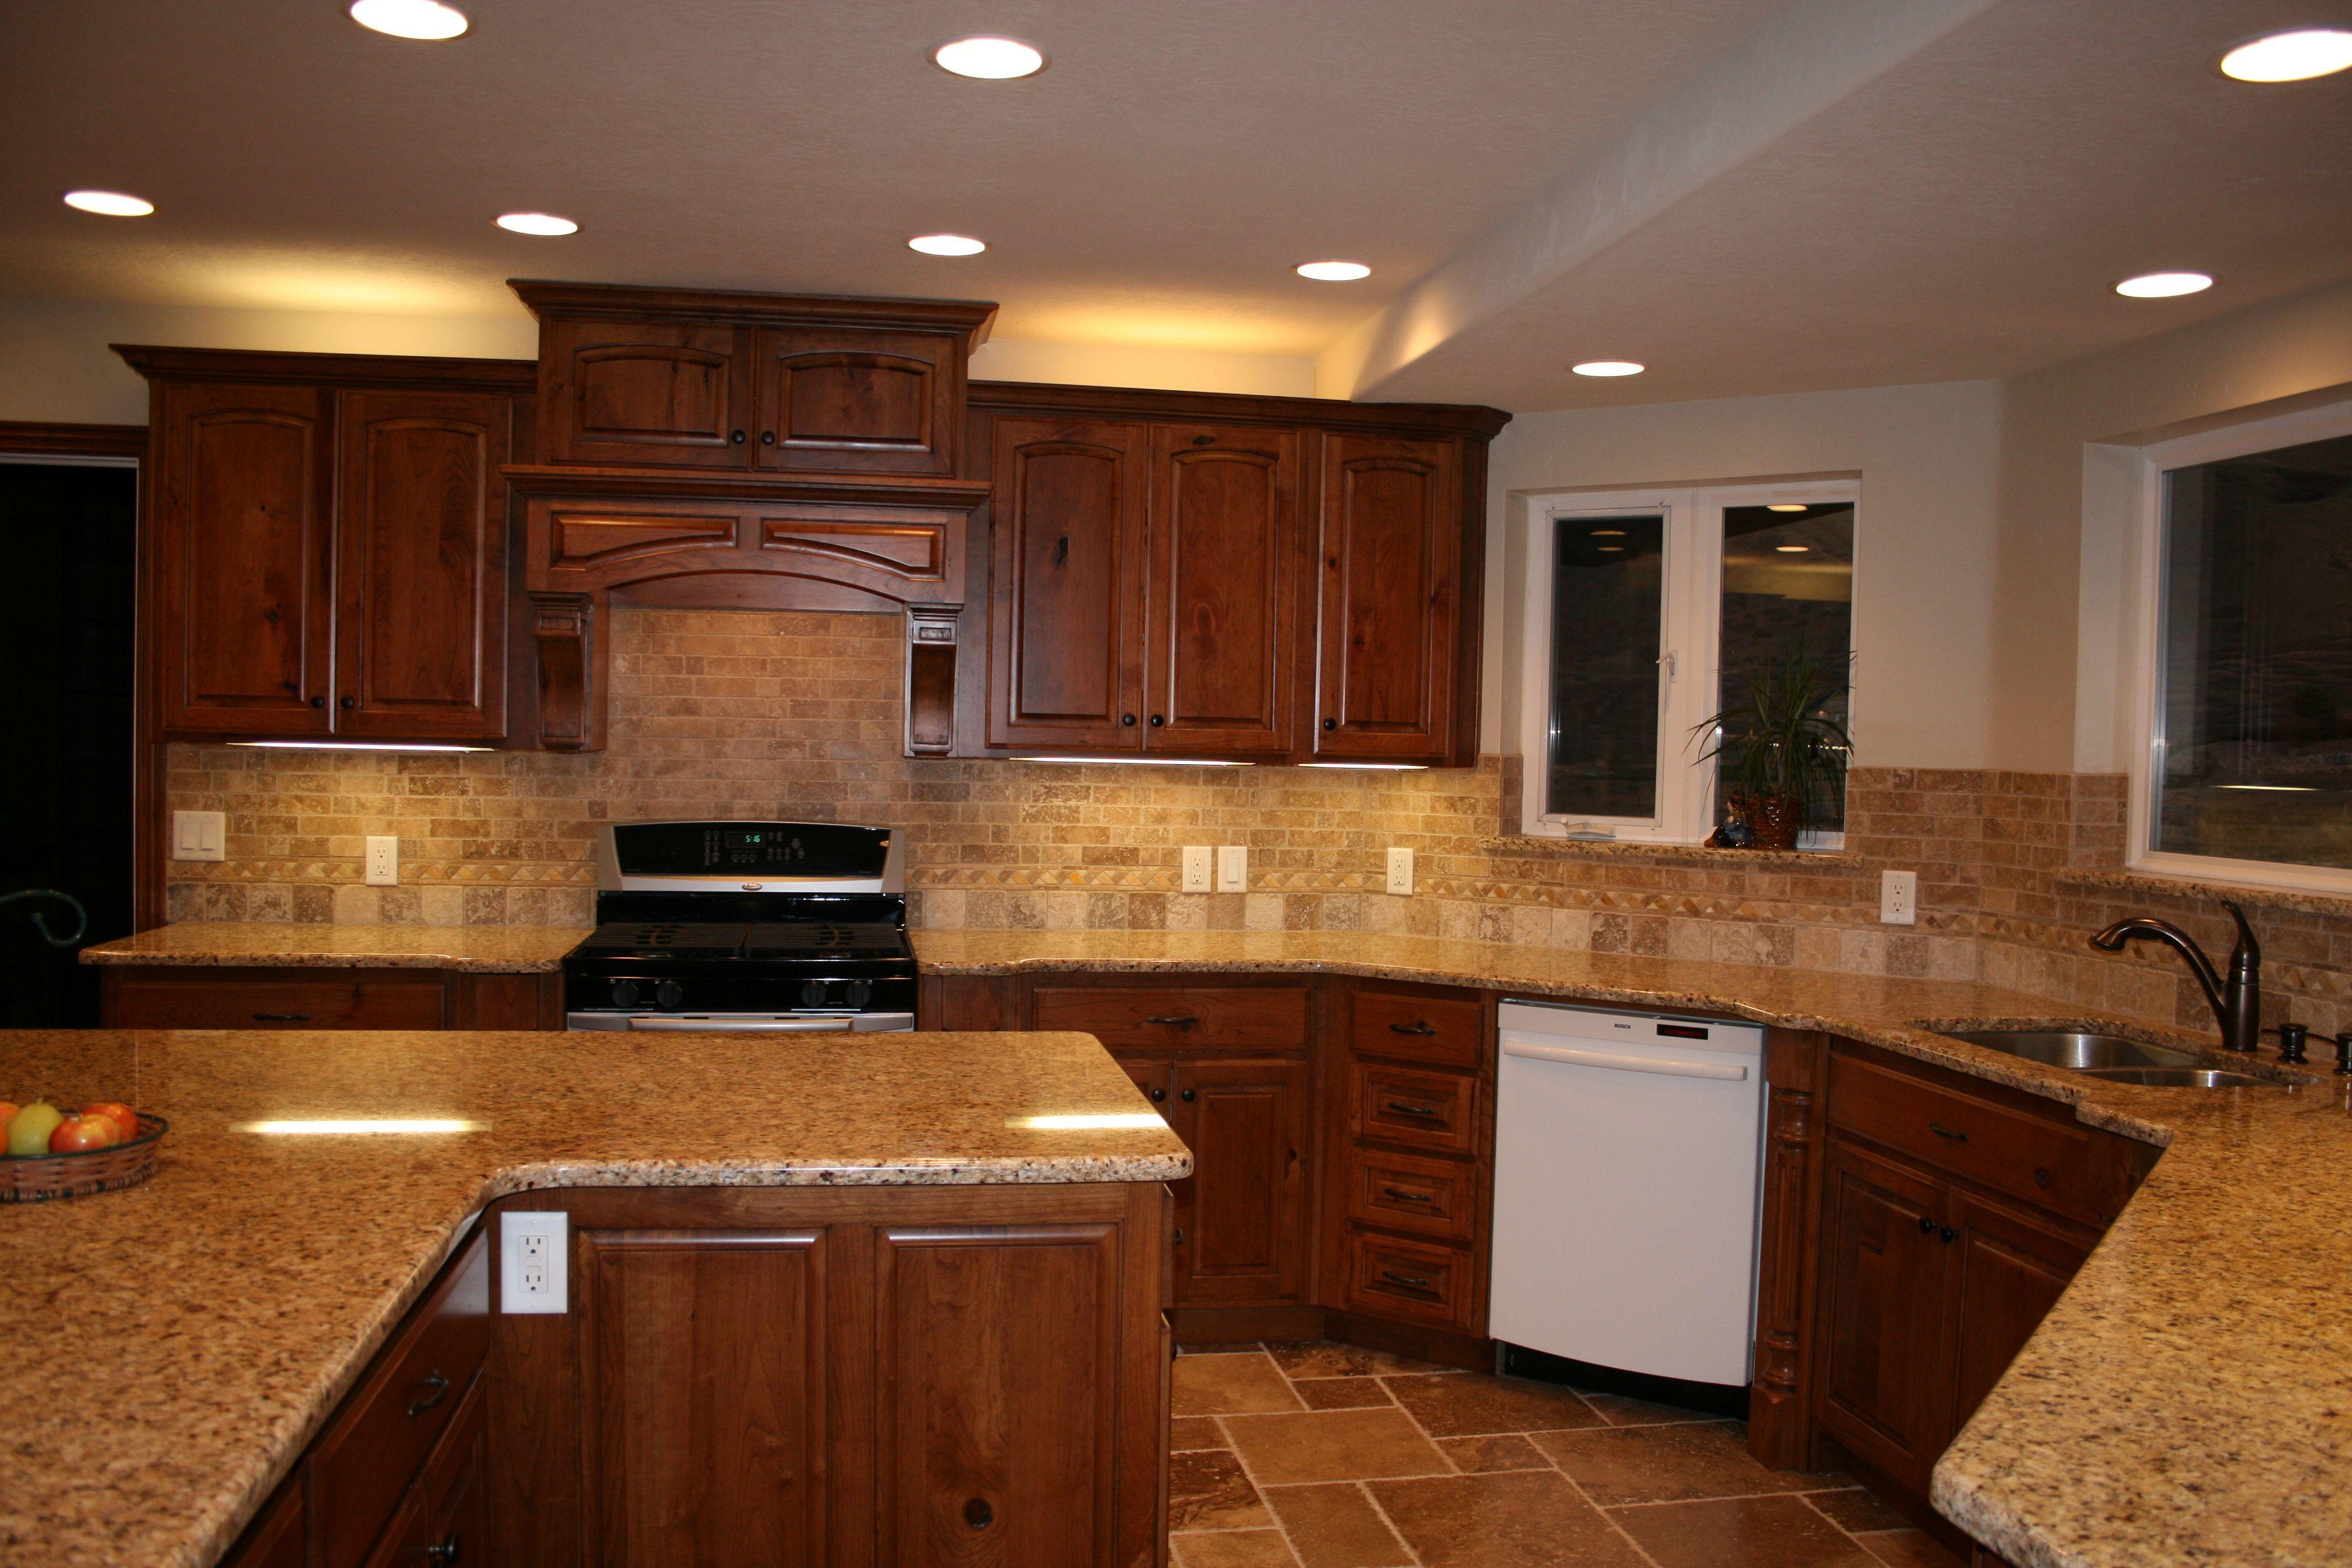 Cherry cabinets with granite countertops home d elegant tile backsplash kitchen